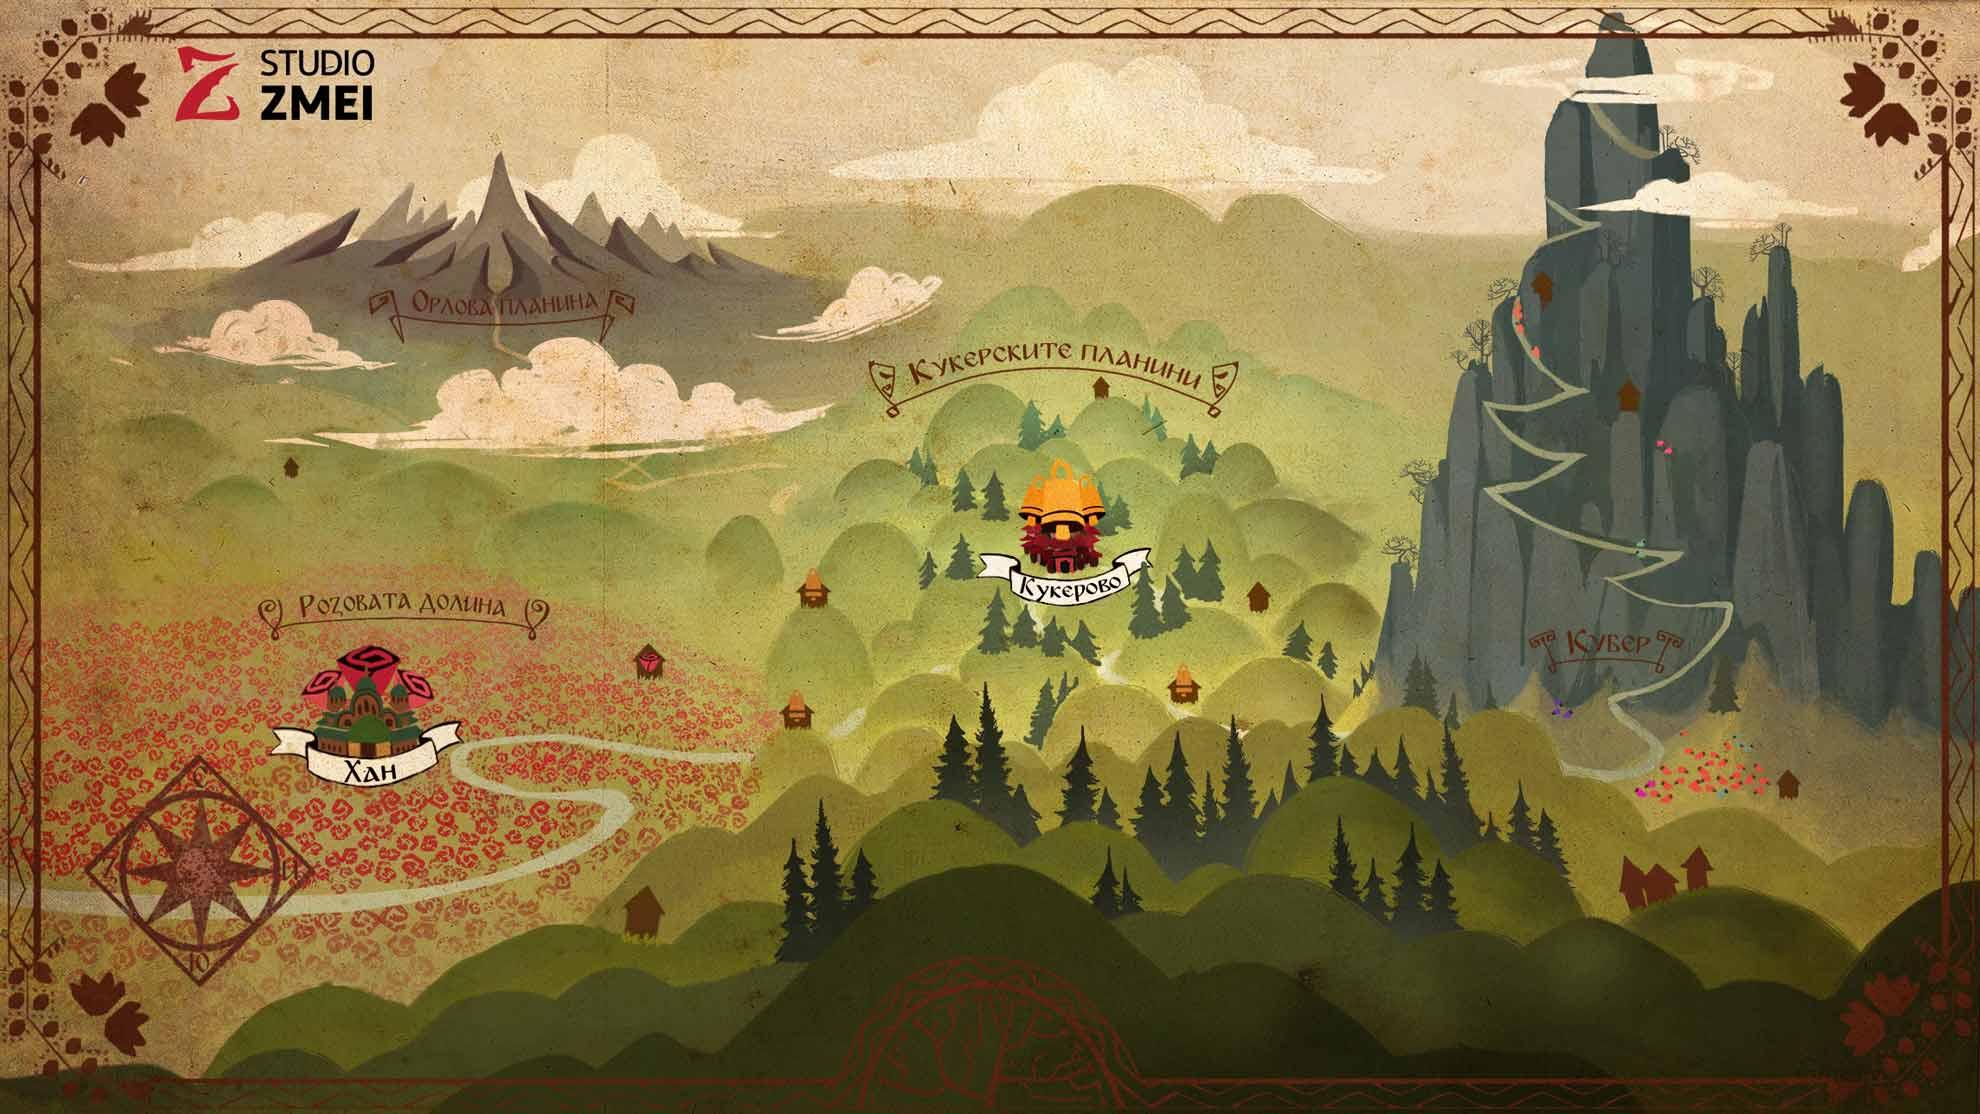 Background Design 09 - The Golden Apple